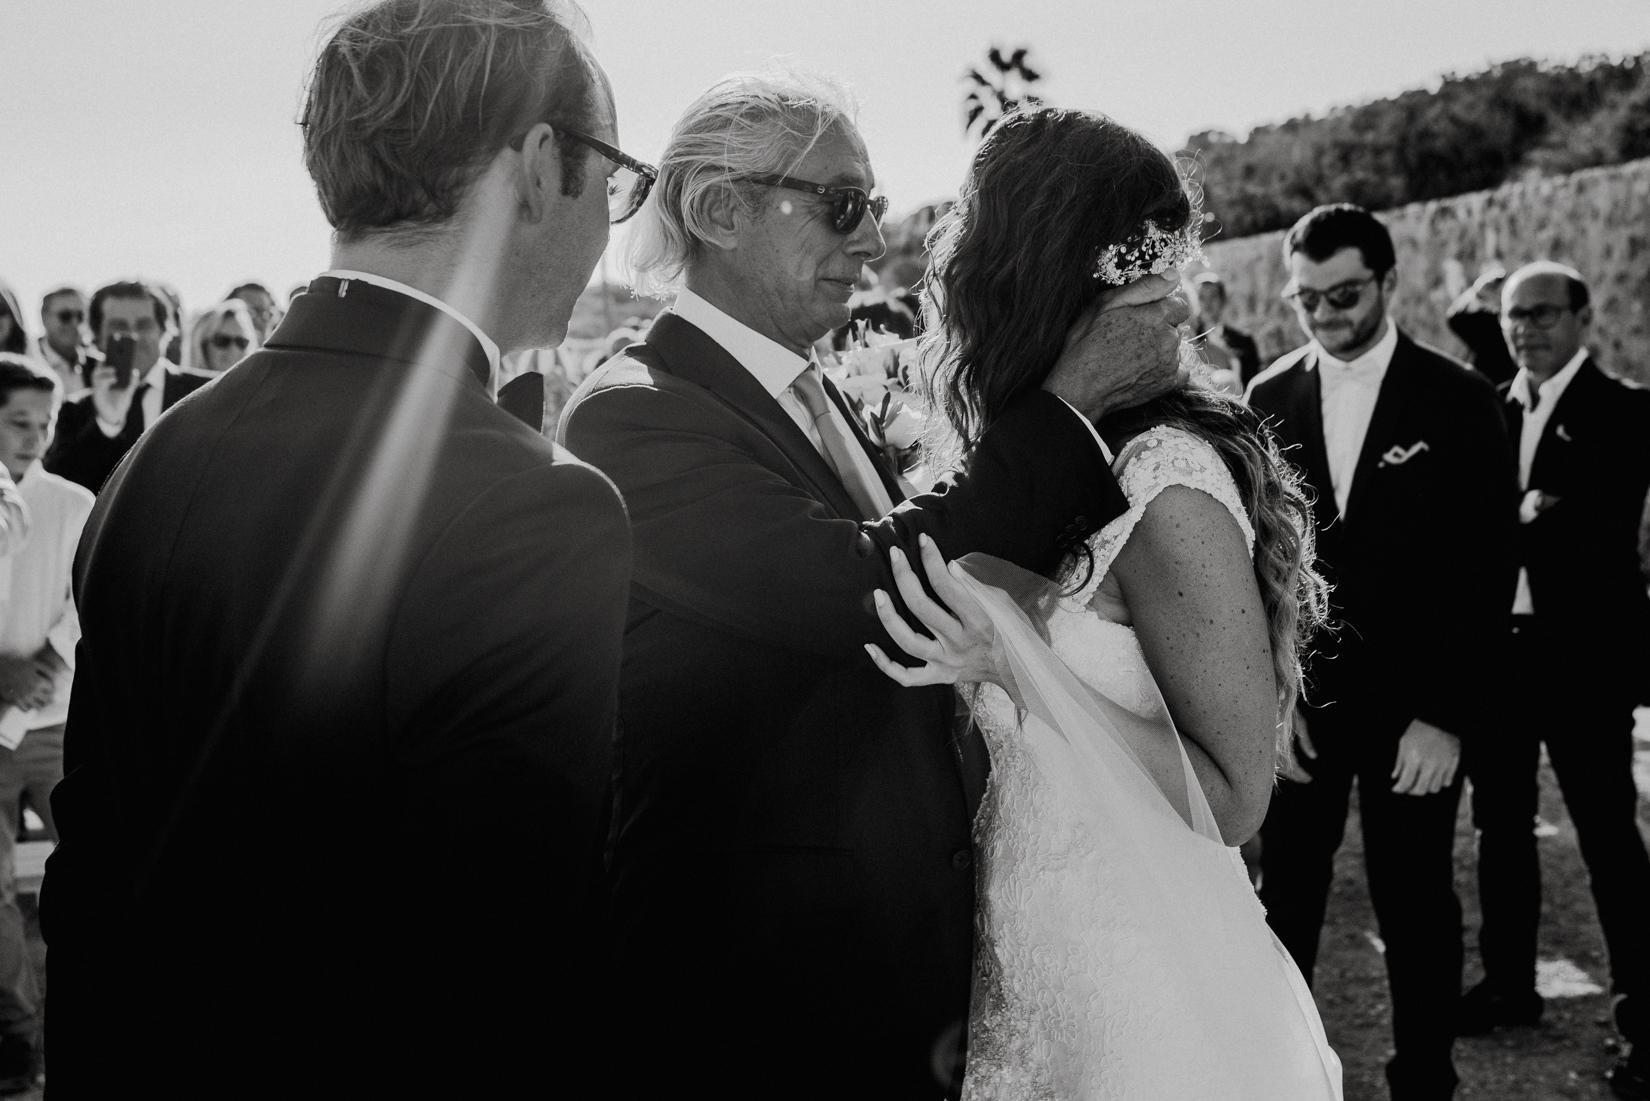 wedding-la-escollera-24.jpg